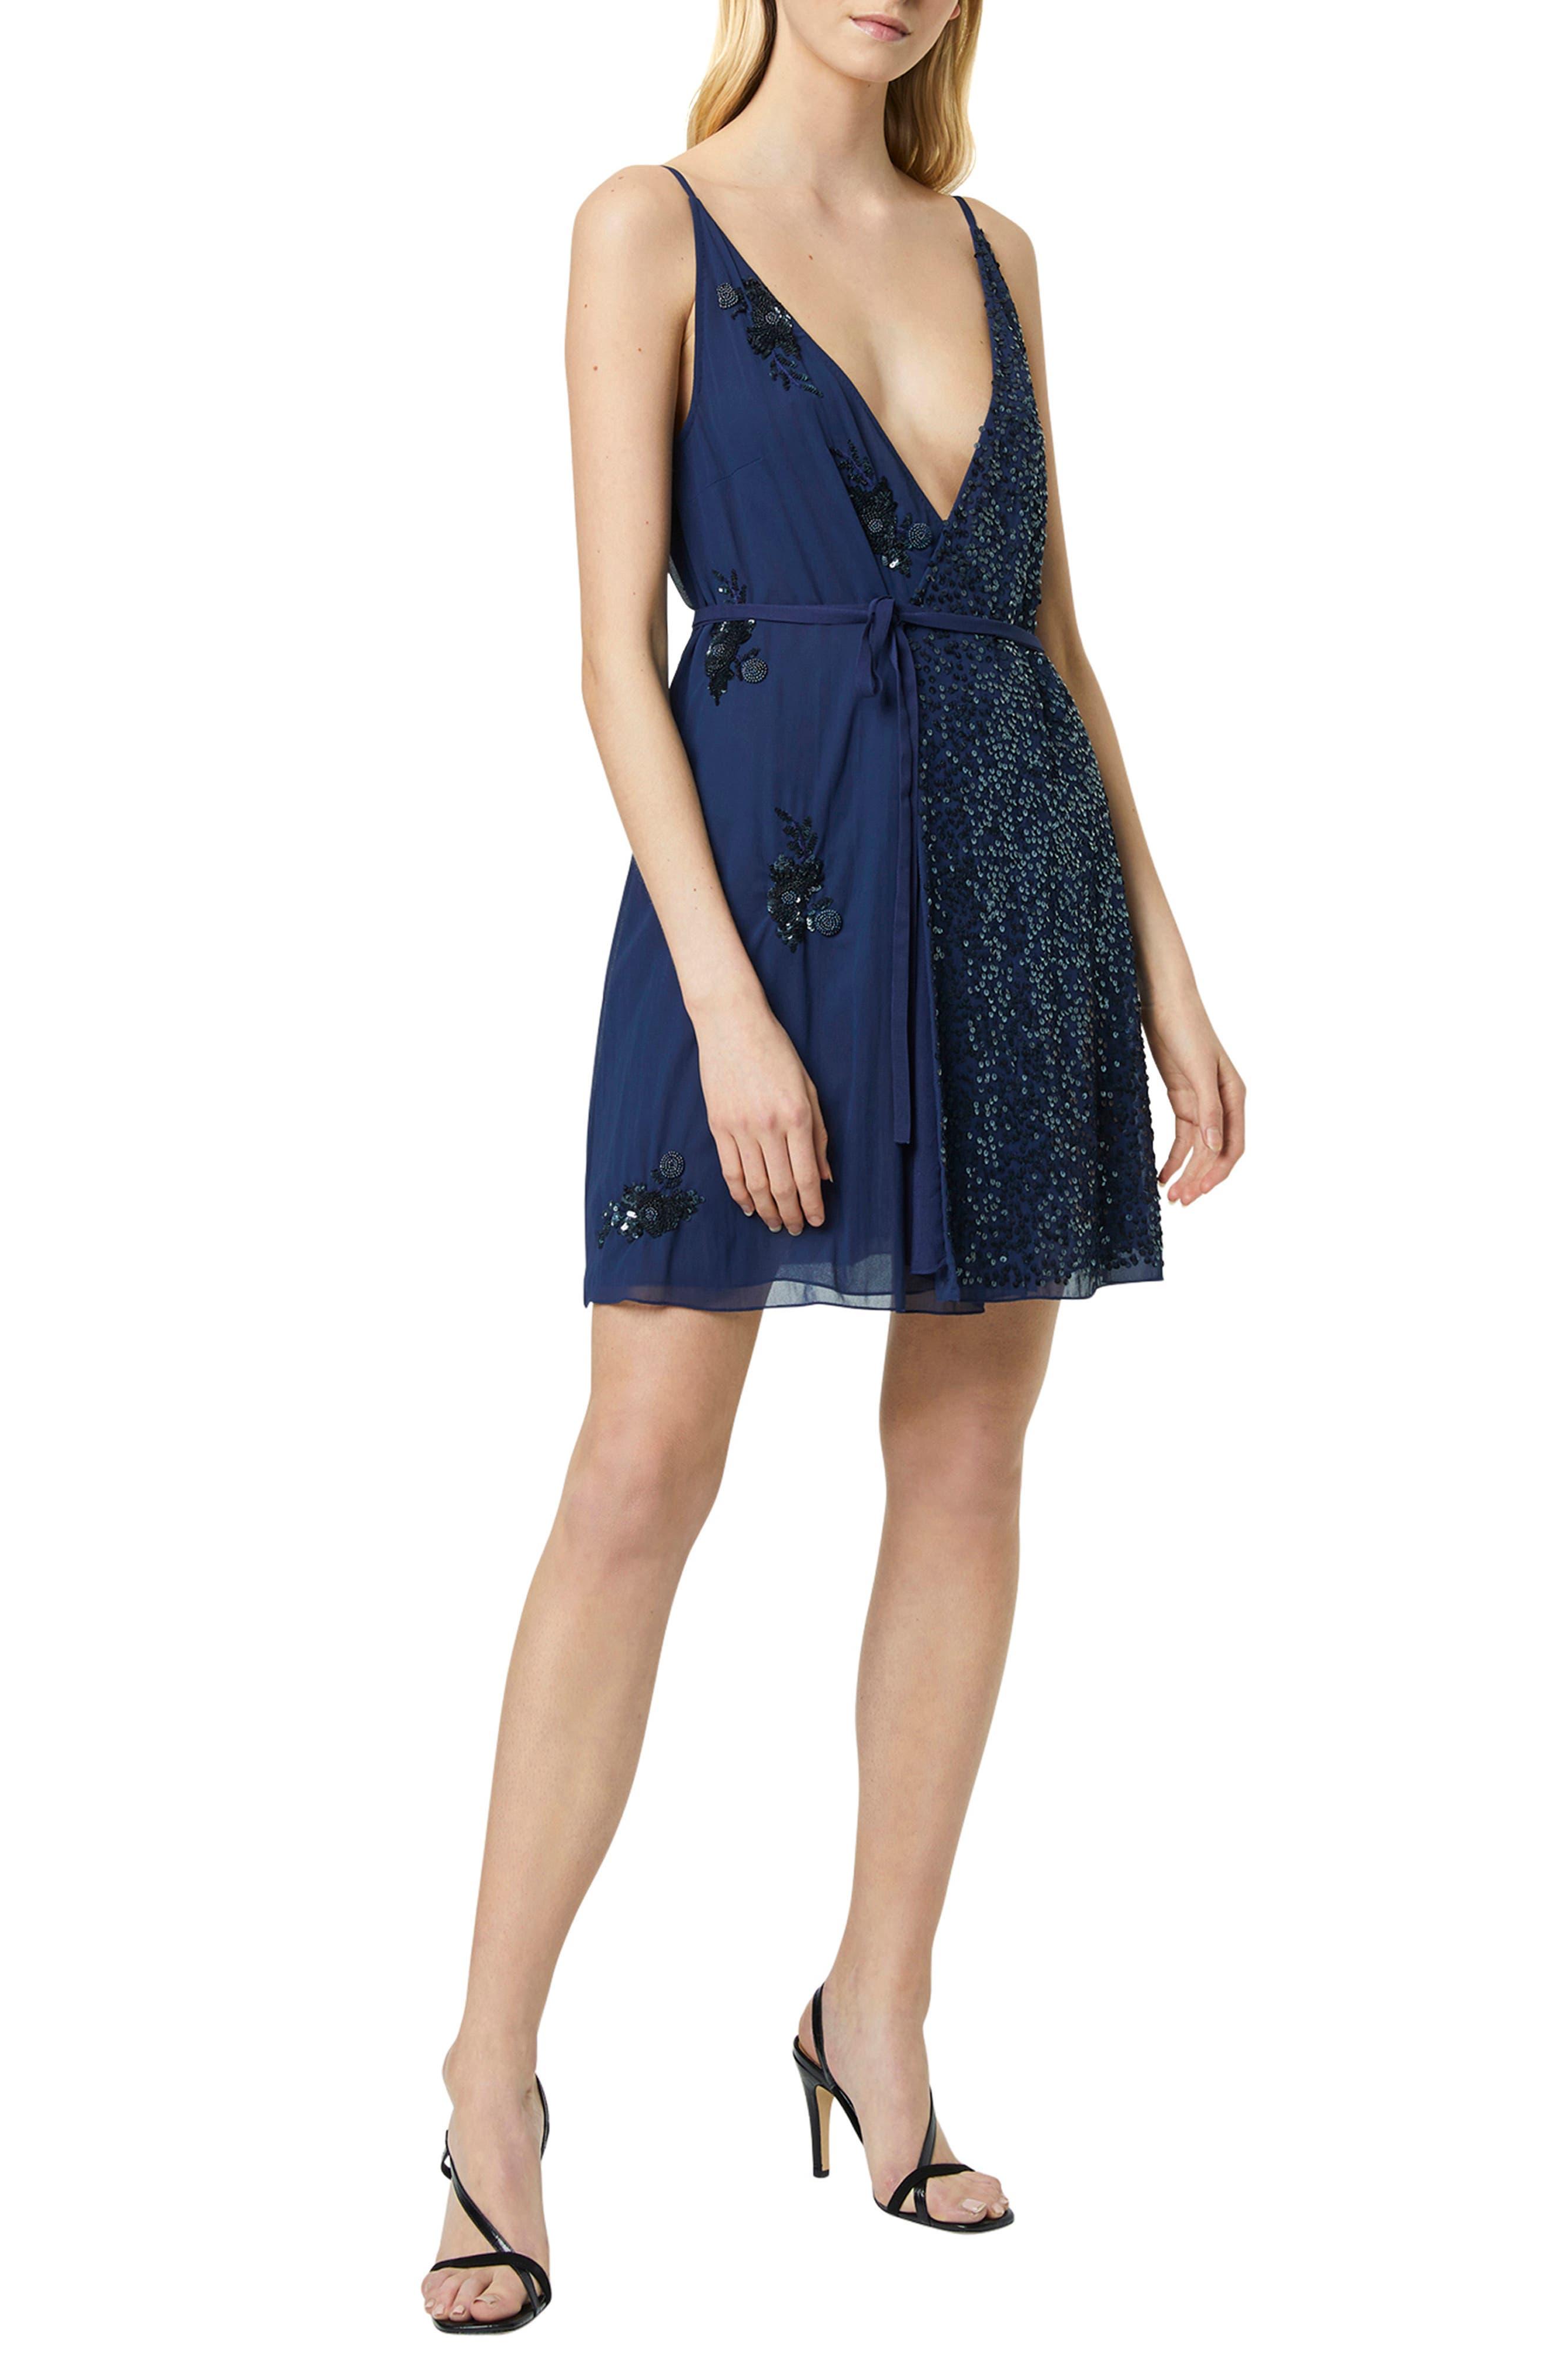 Image of French Connection Aurora Embellished Dress